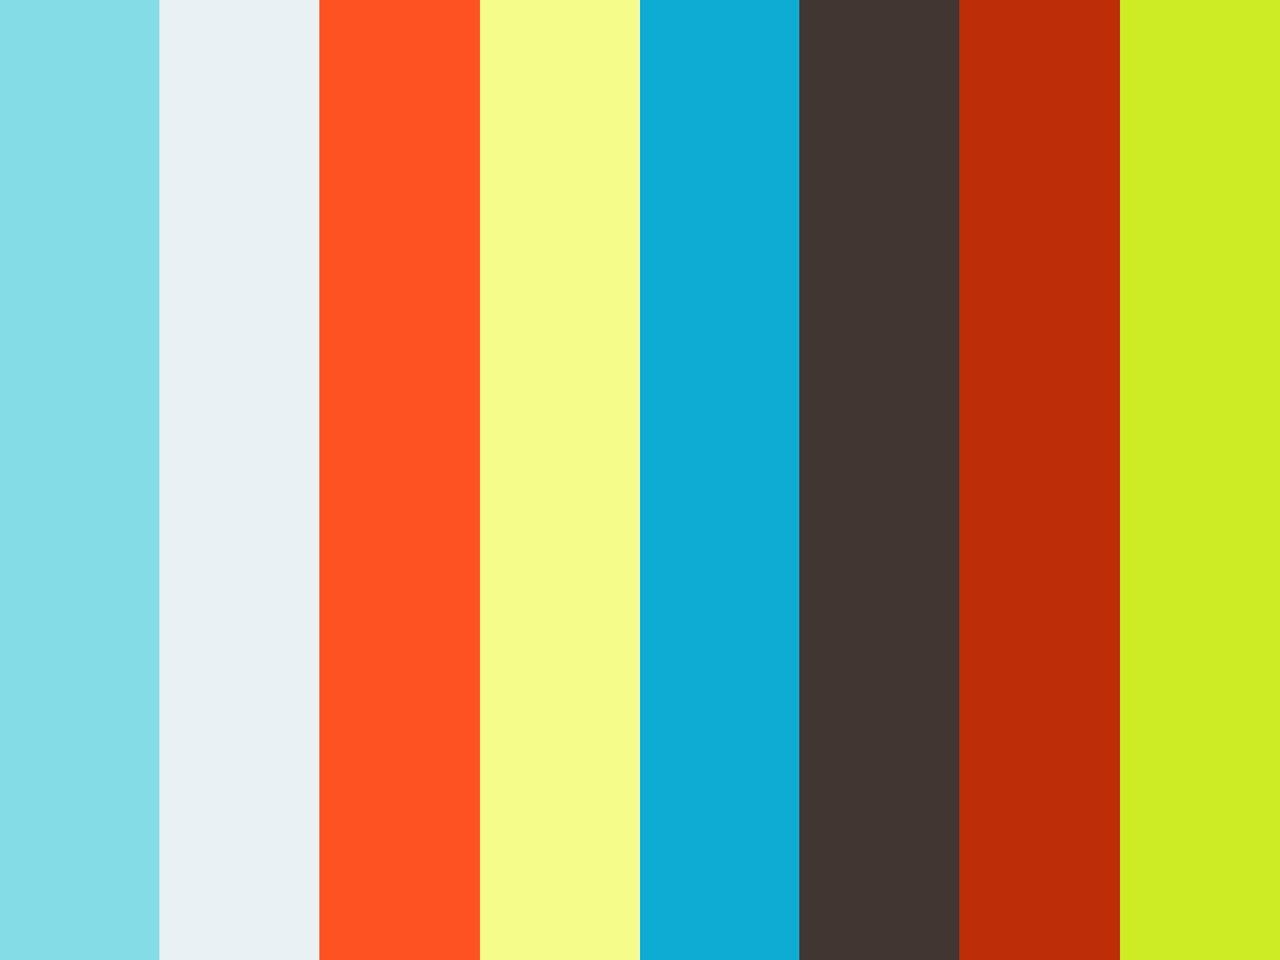 JAYCEEOH // Lifestylez Concert Tour